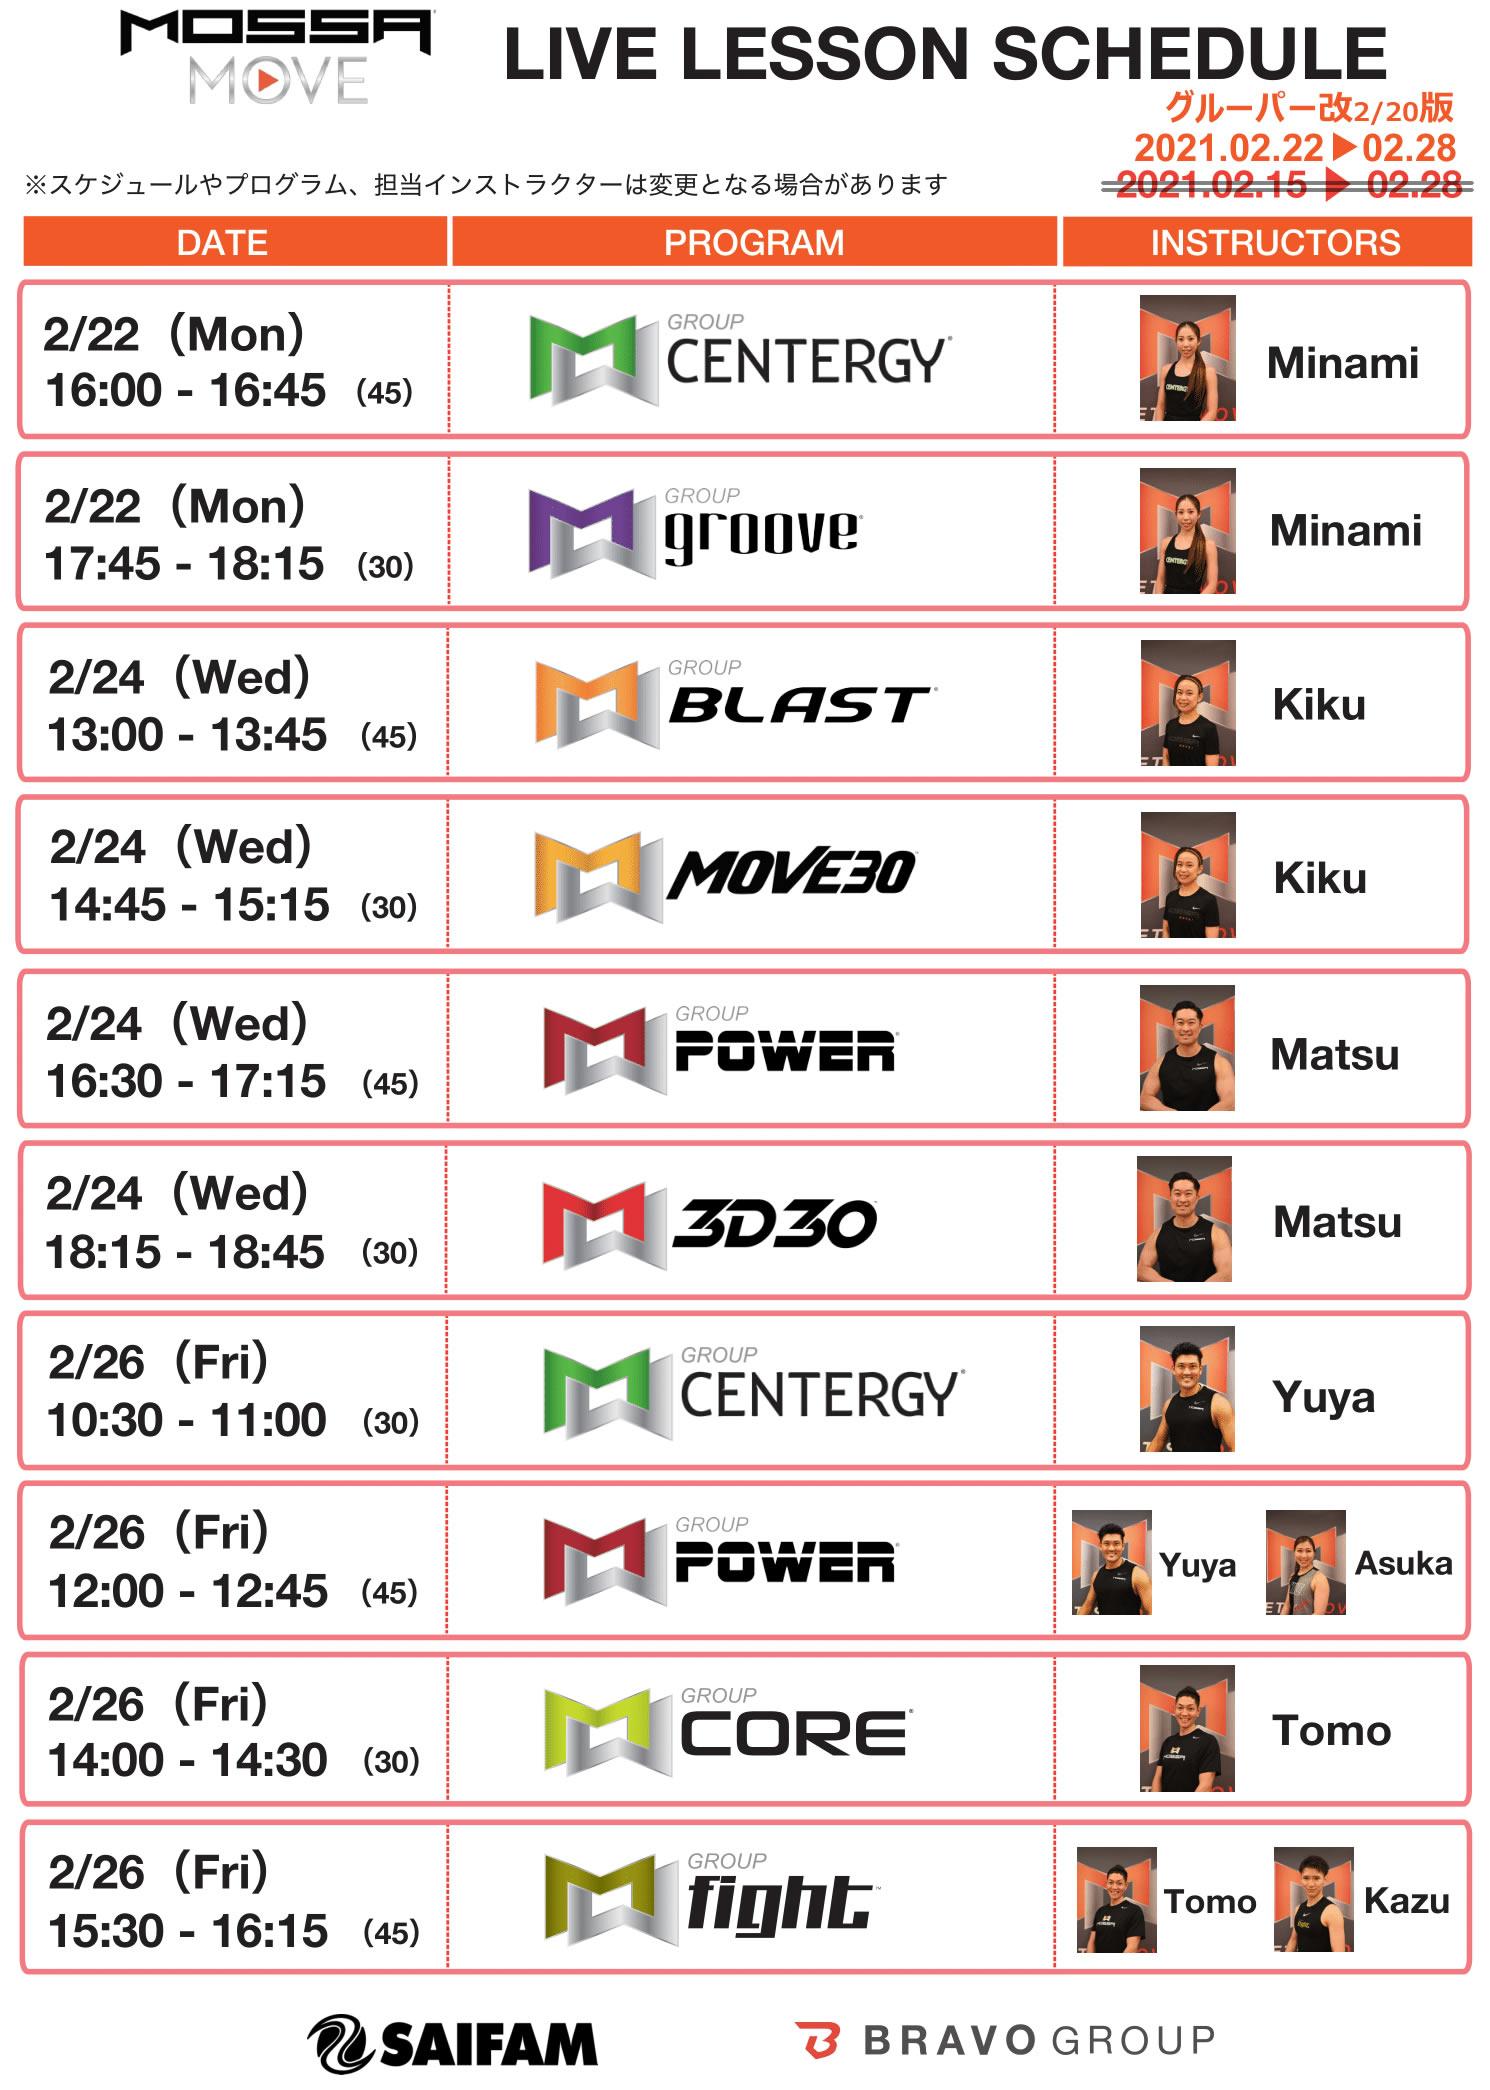 【MOSSA MOVE 2月22-28ライブ配信スケジュール2/20改訂版】